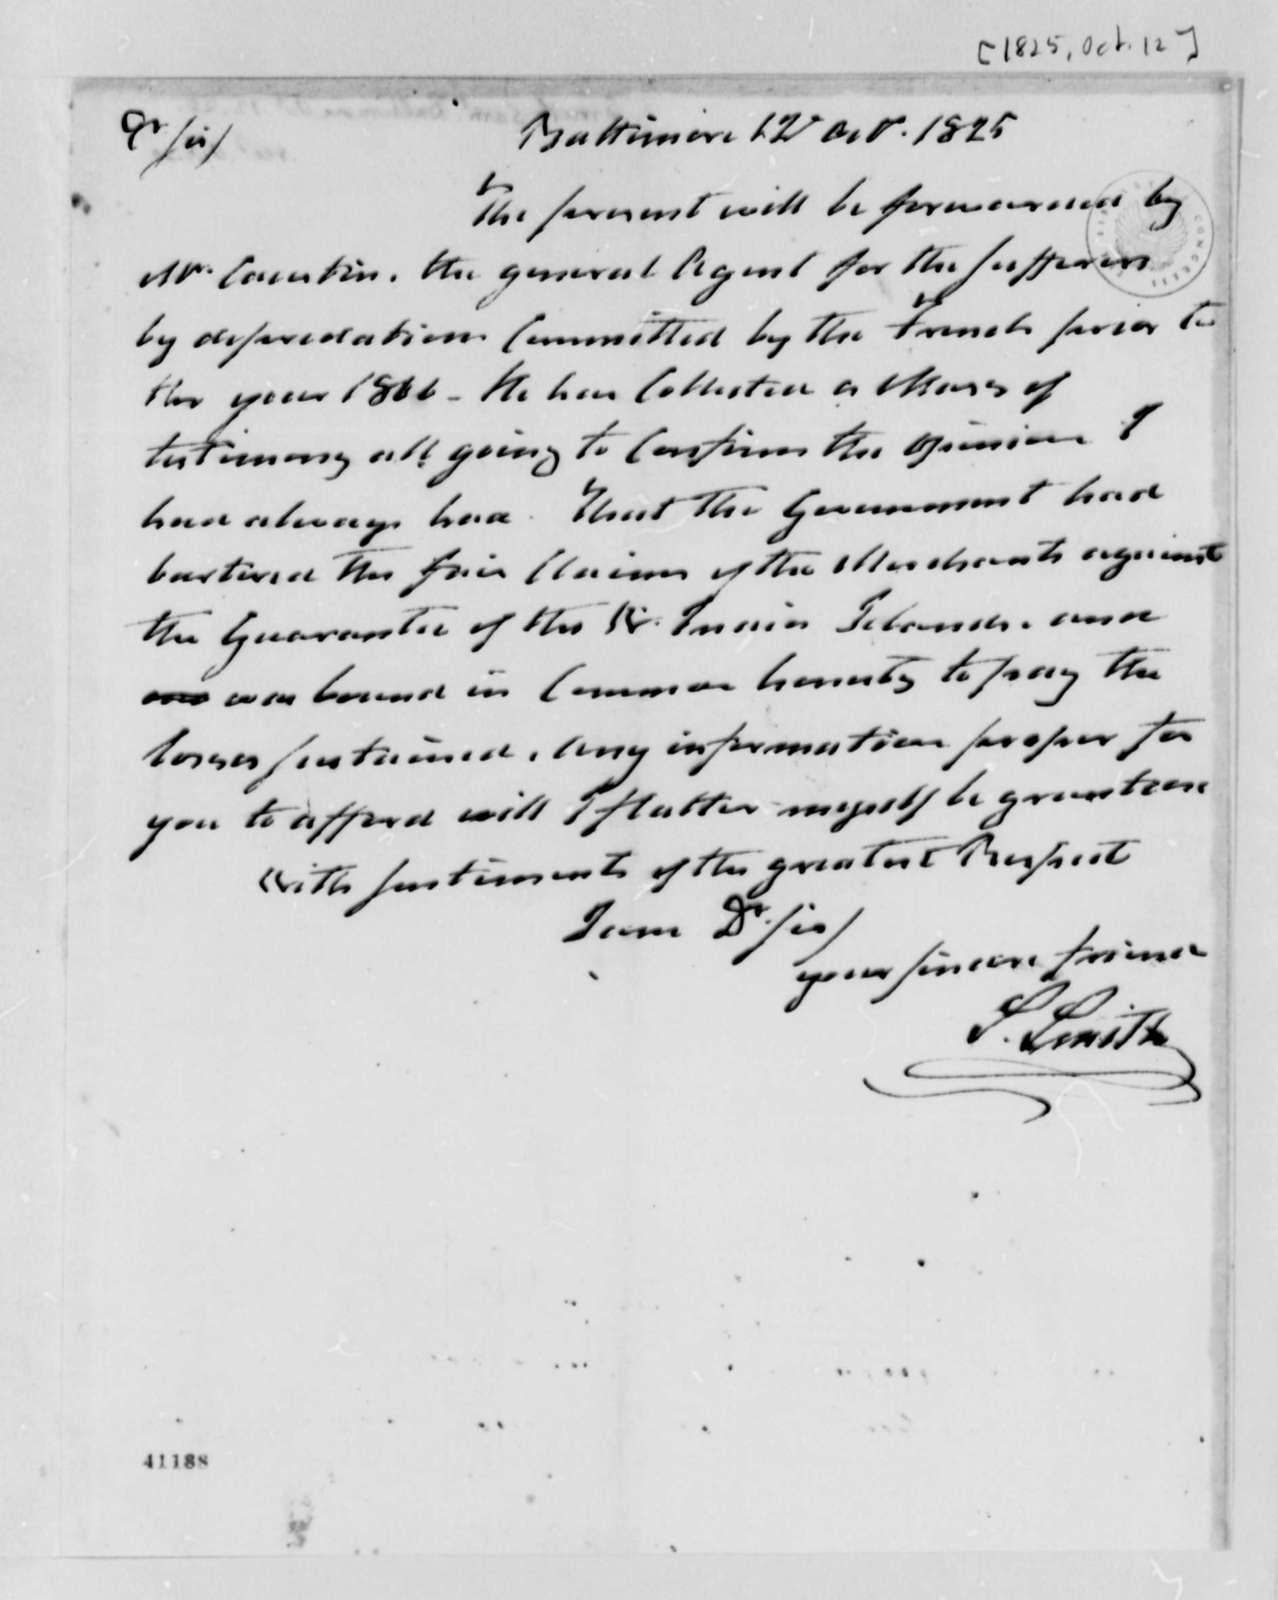 Samuel Smith to Thomas Jefferson, October 12, 1825